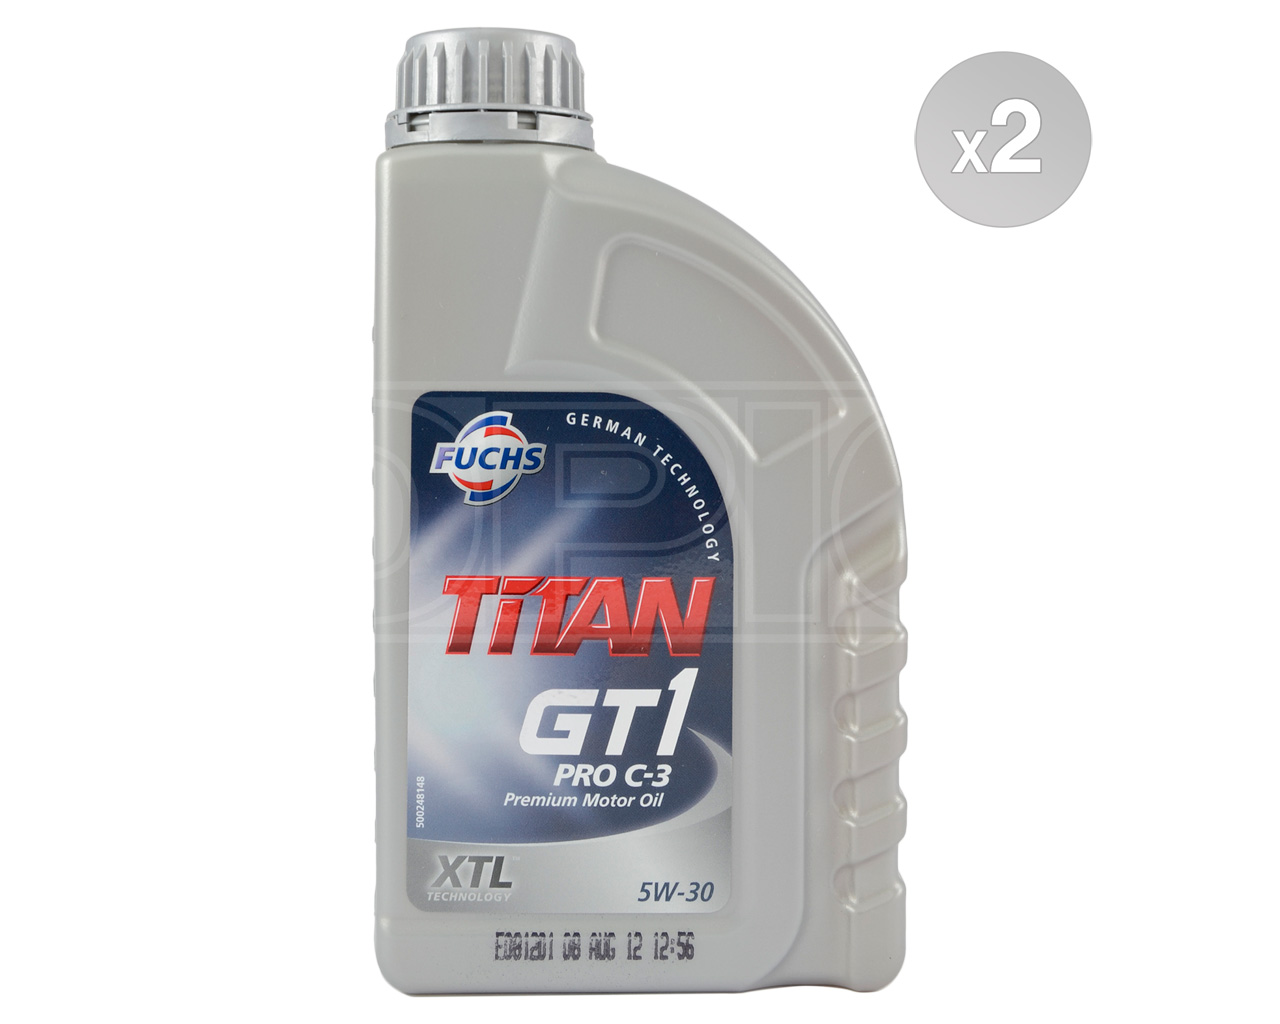 Fuchs TITAN GT1 PRO C-3 XTL 5W-30 Fully Synthetic Engine Oil